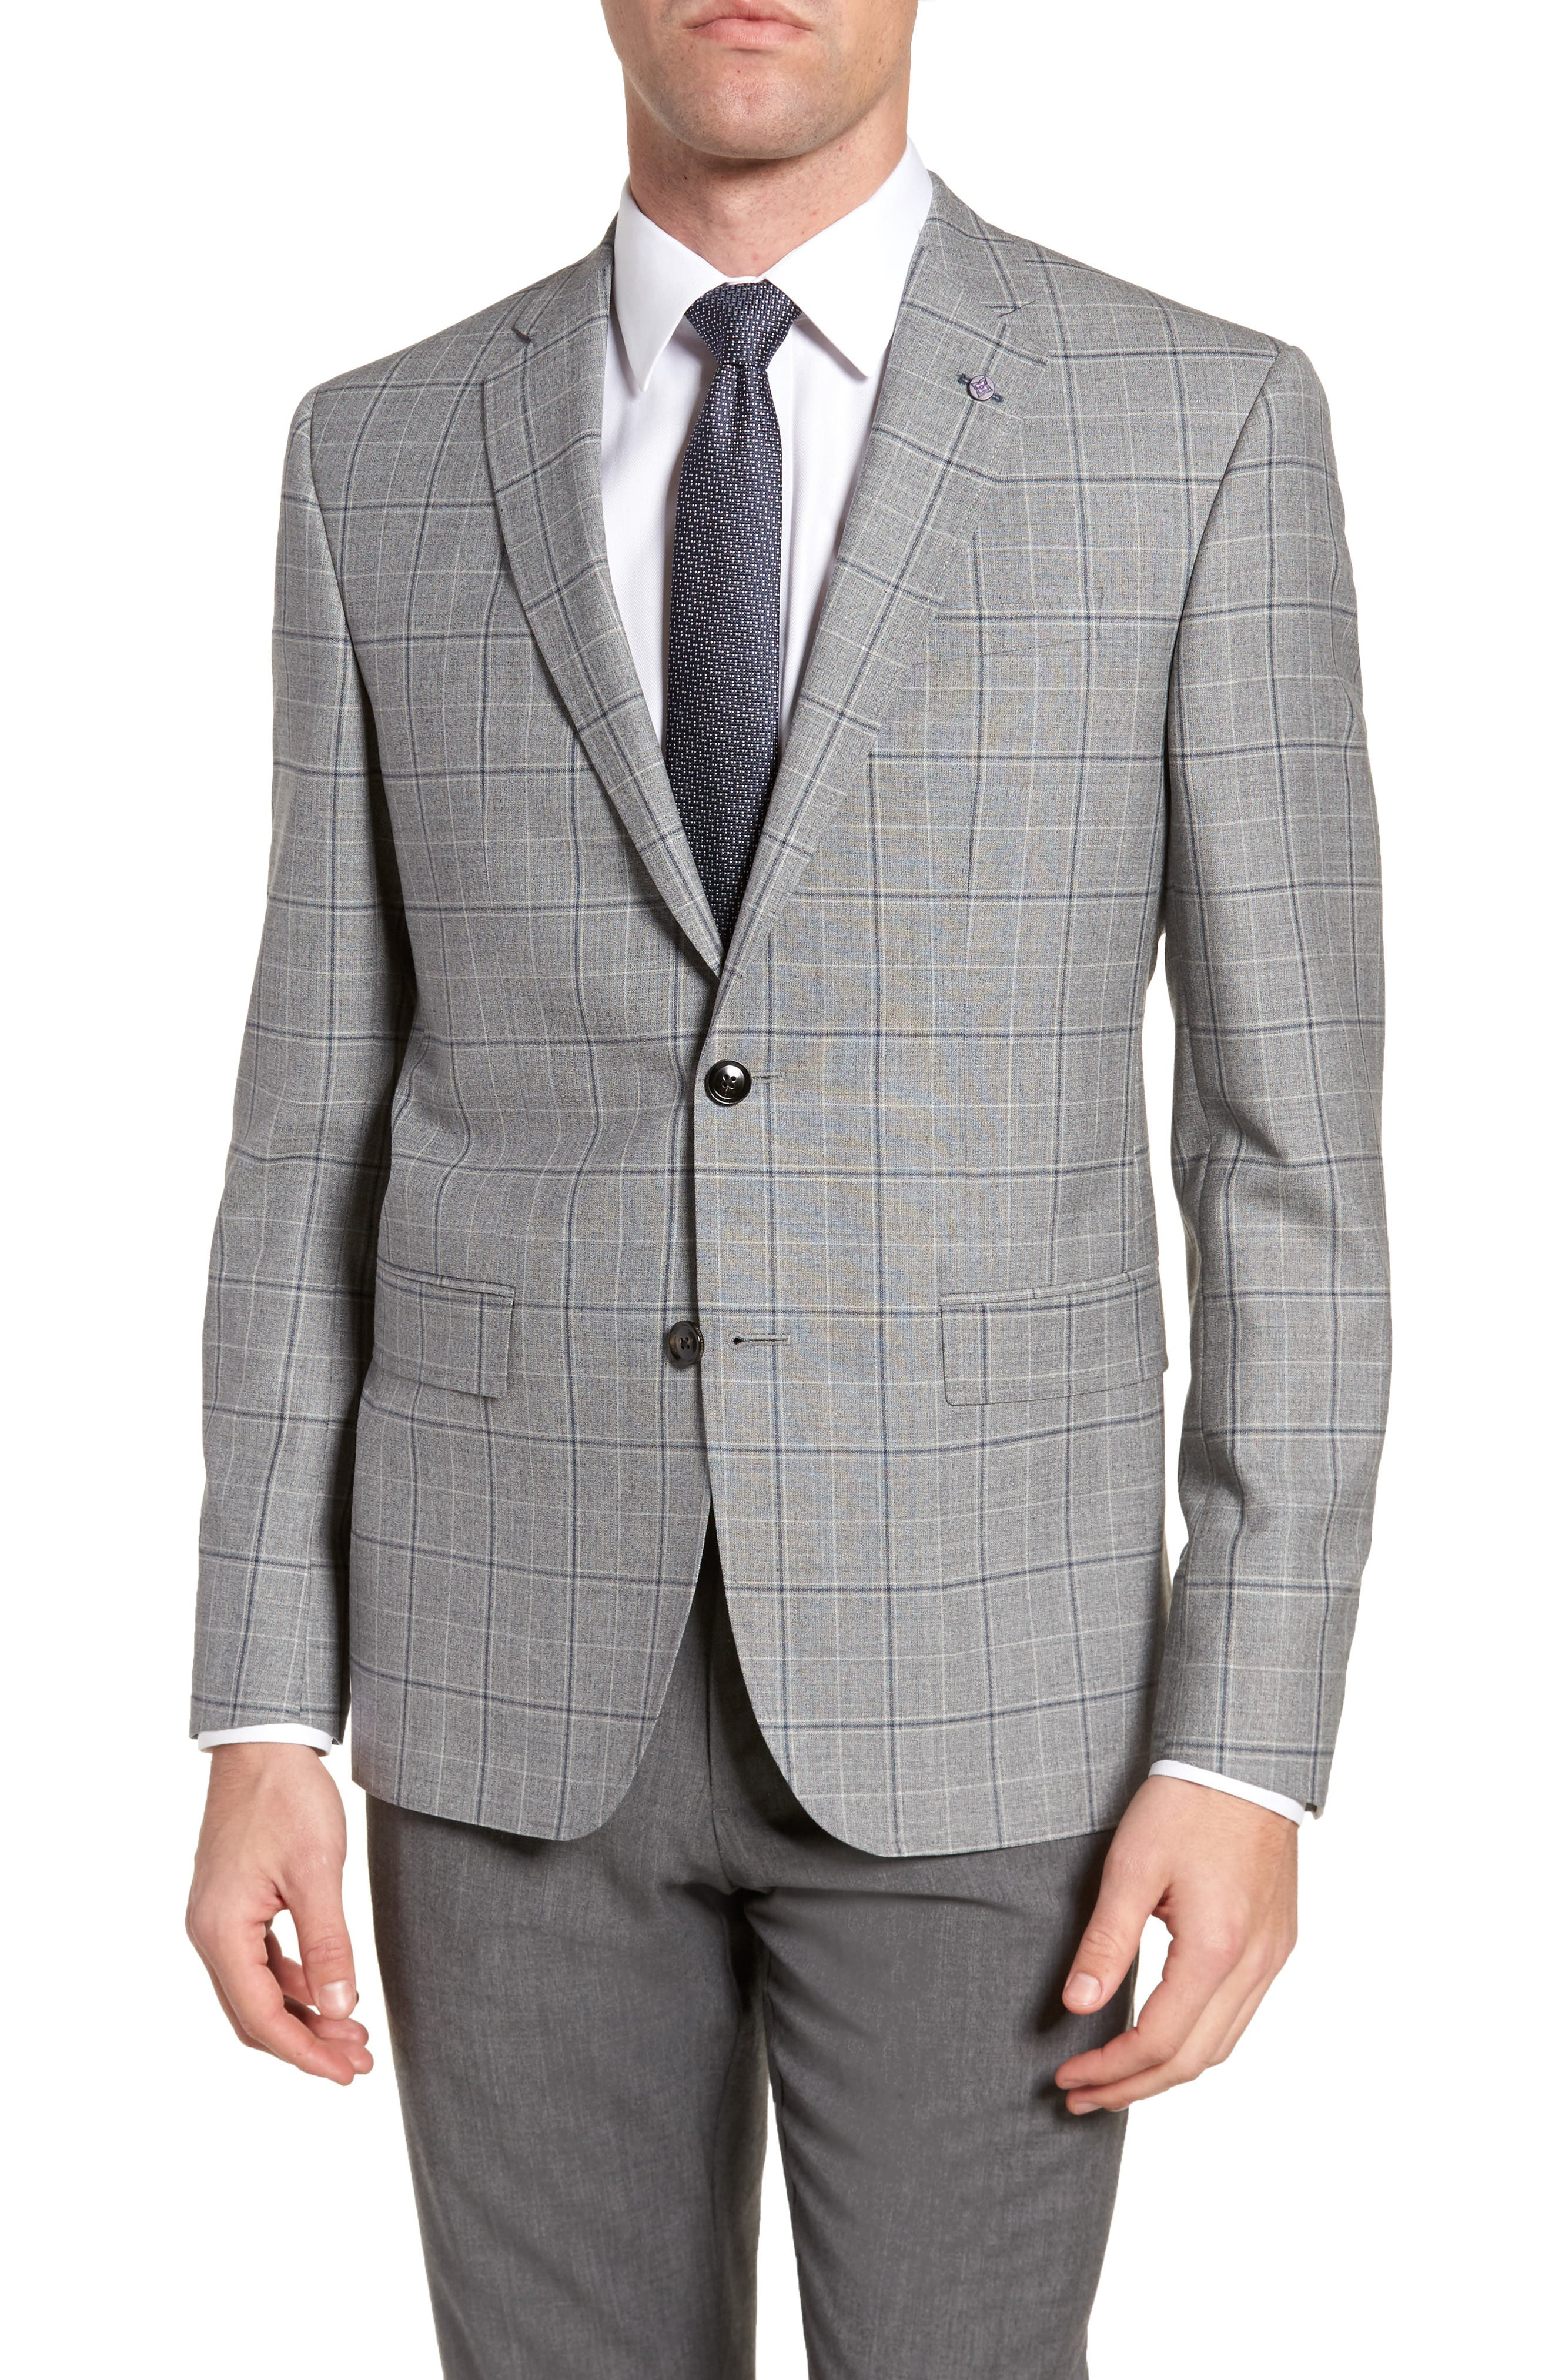 Jay Trim Fit Plaid Wool Sport Coat,                             Main thumbnail 1, color,                             Light Grey